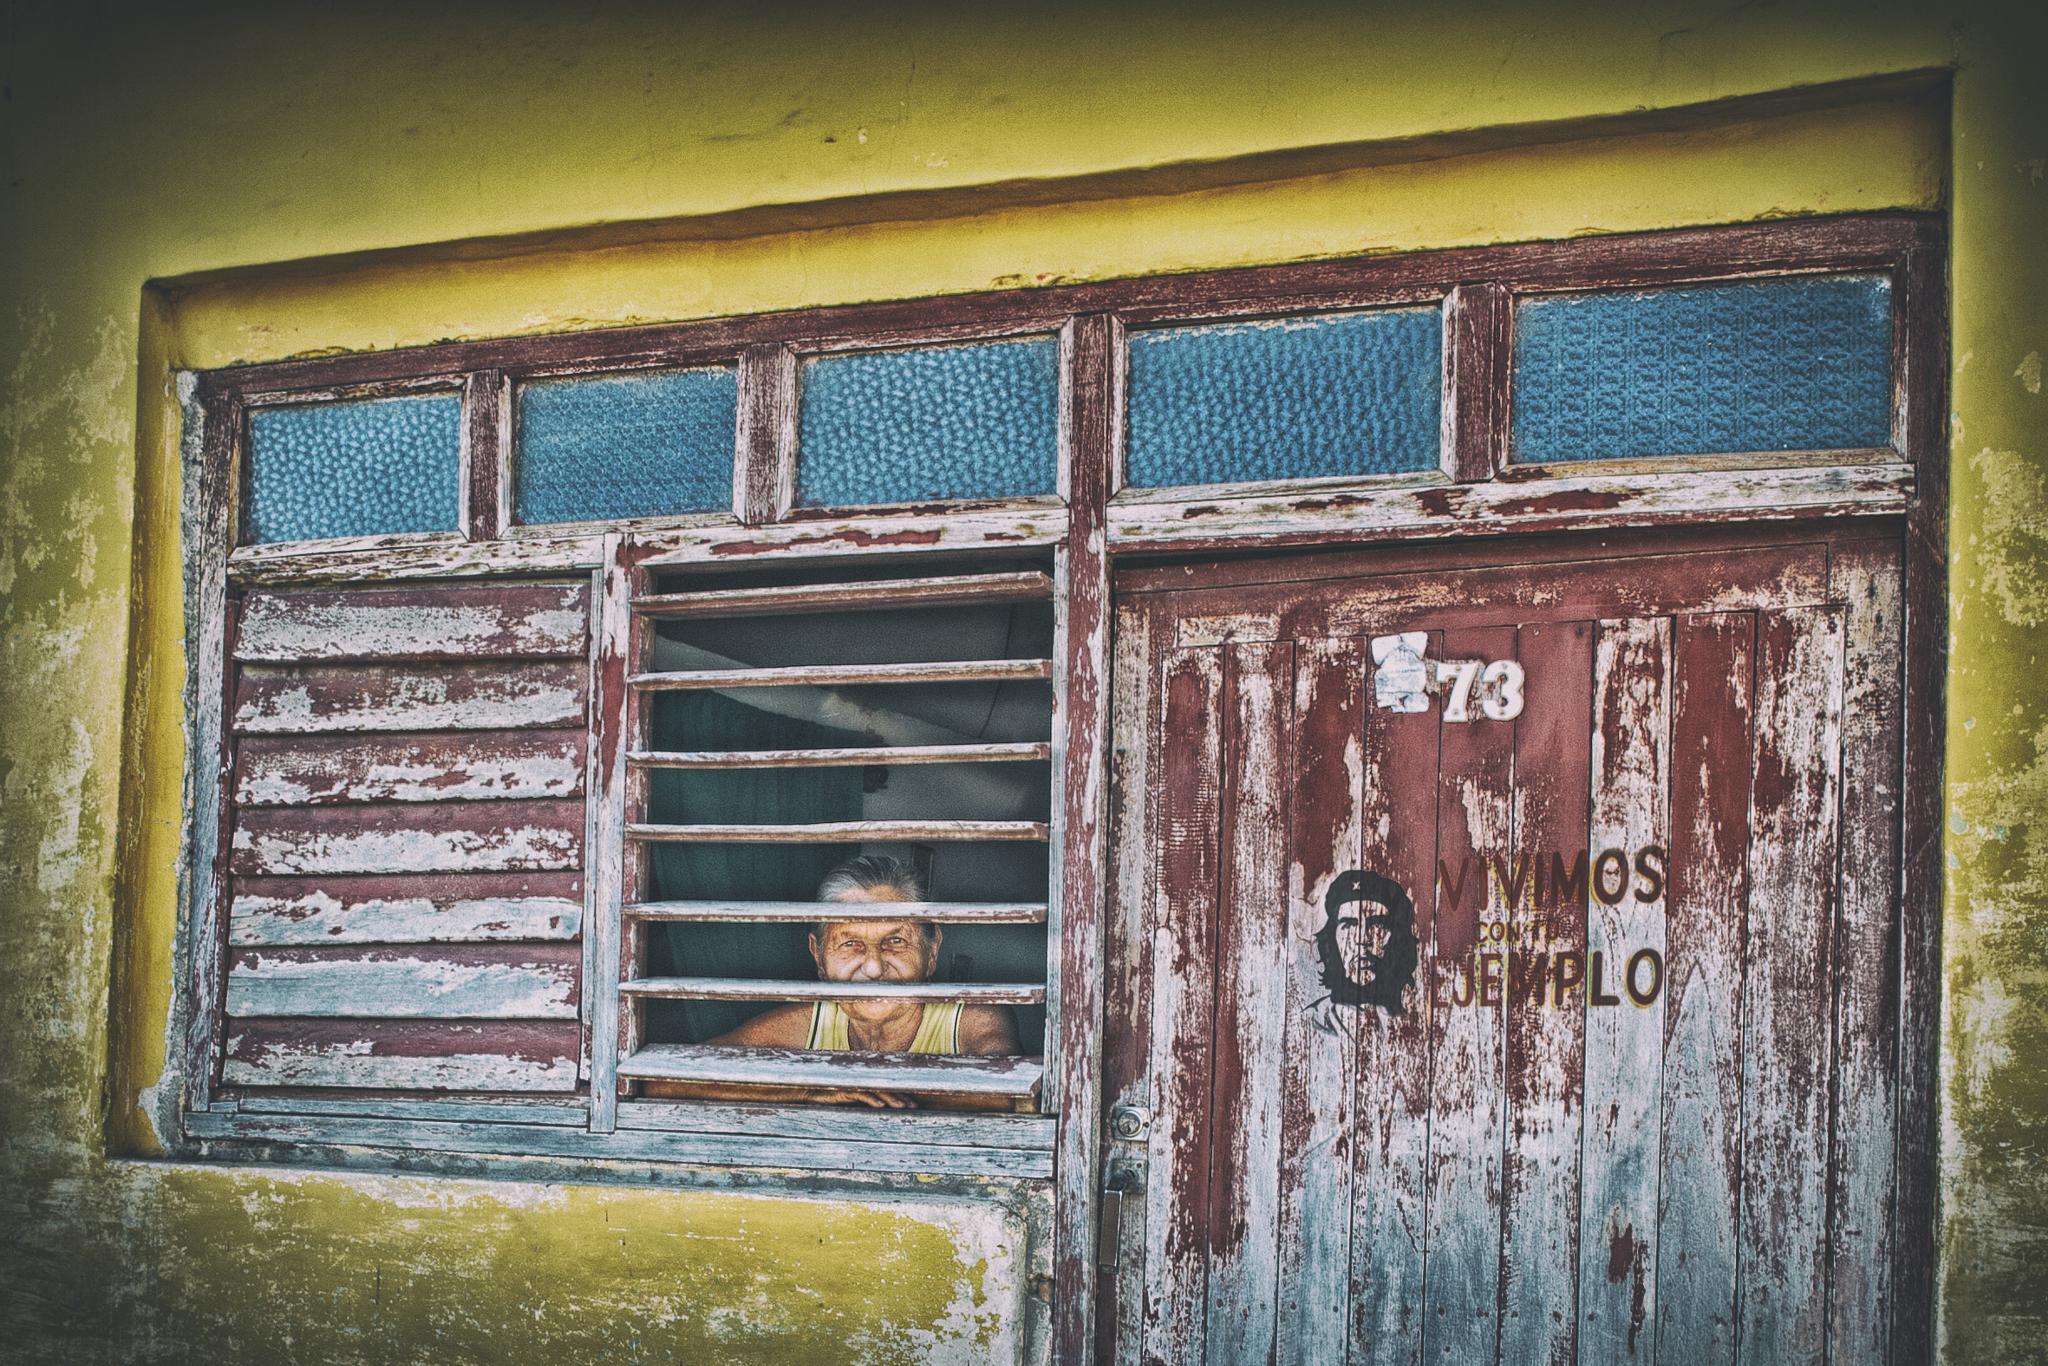 la finestra by Ascione Rosario